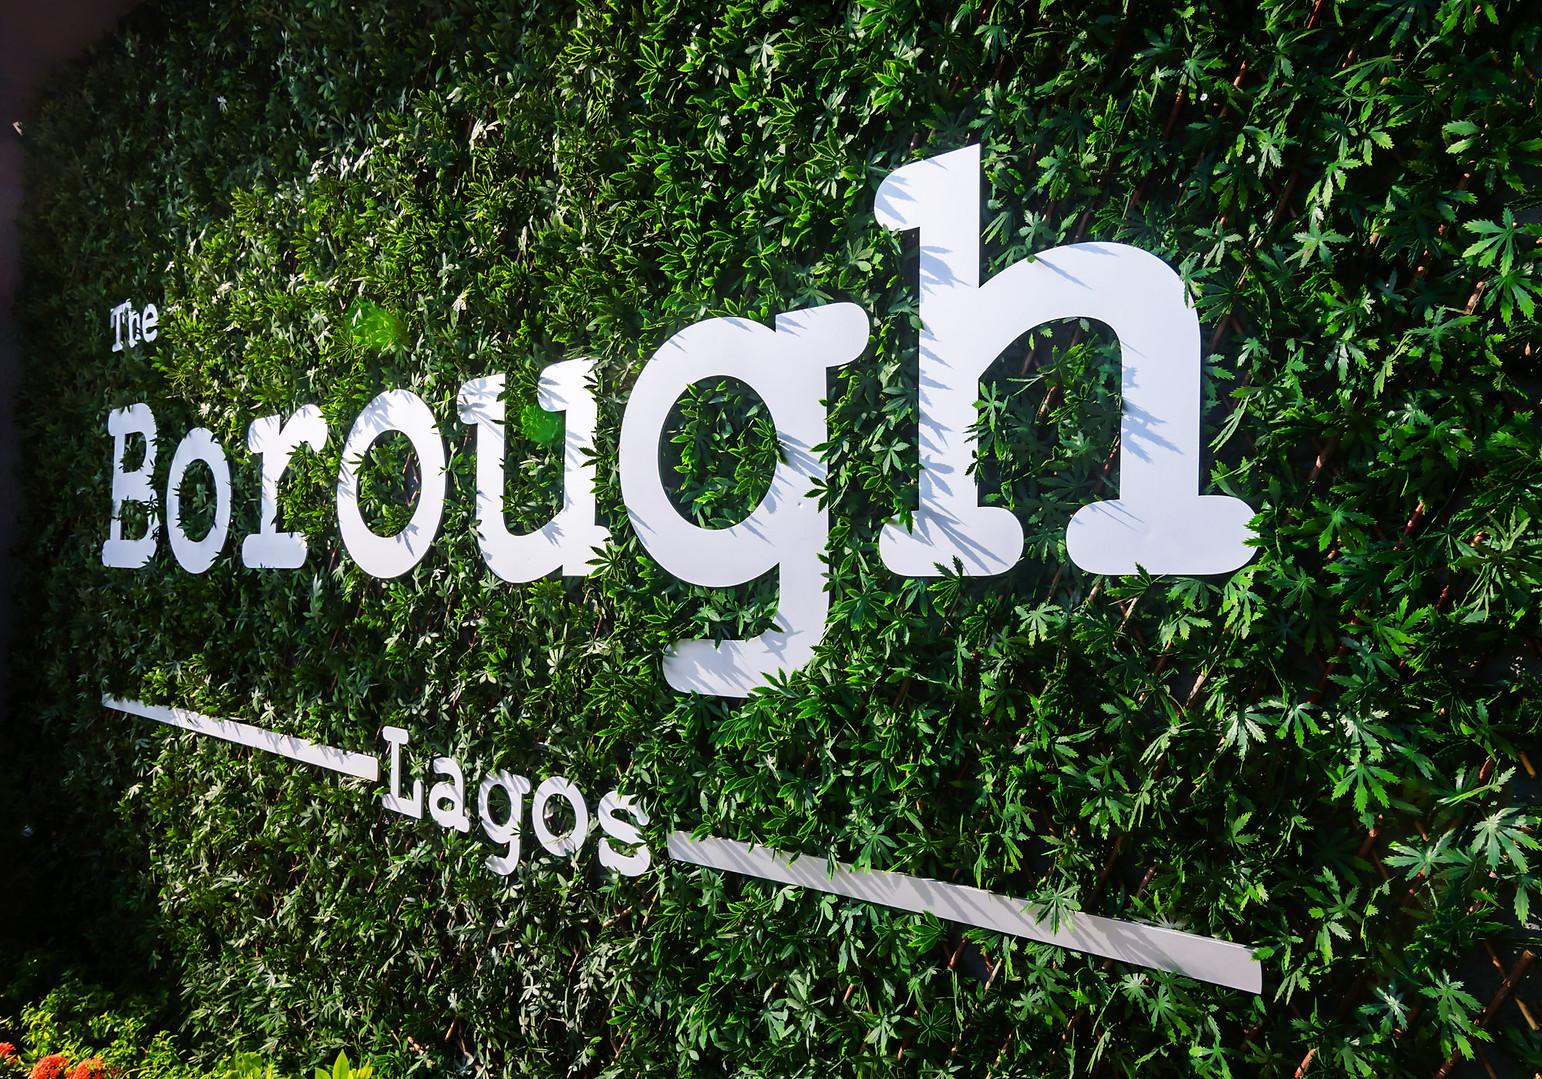 The Borough_Hotel_34.jpg